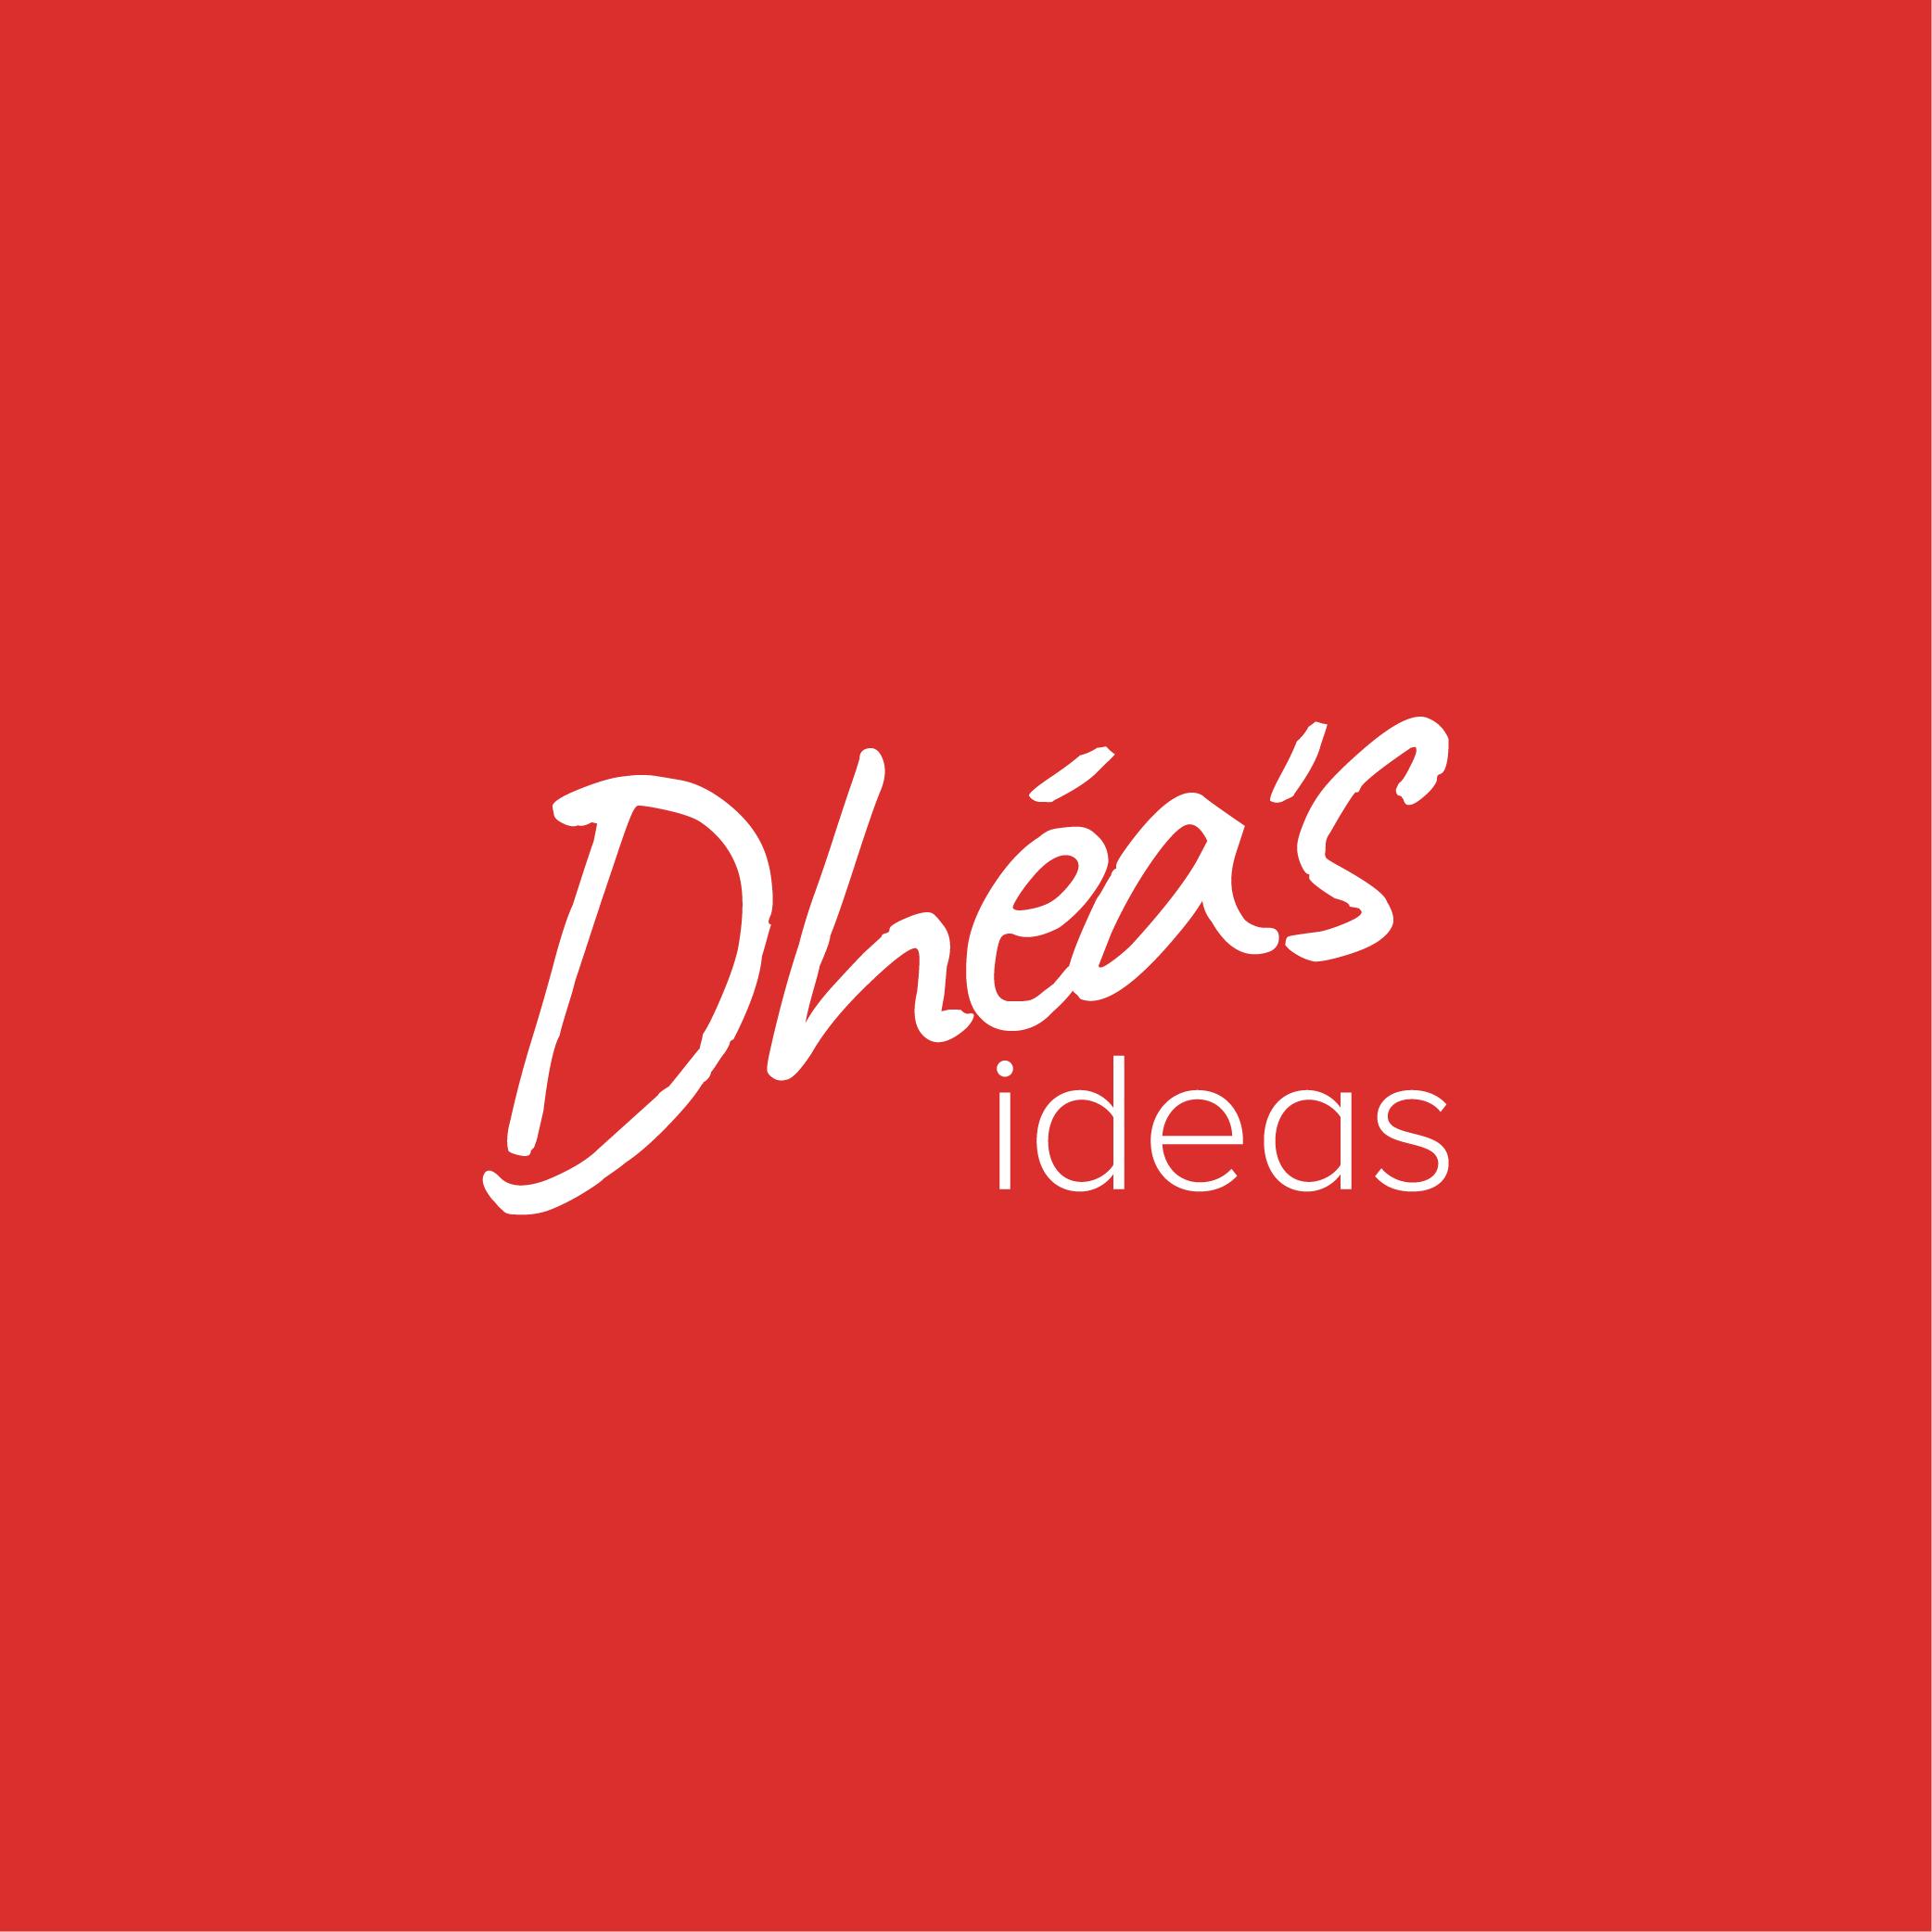 personal brand blog logos_Dhea.png